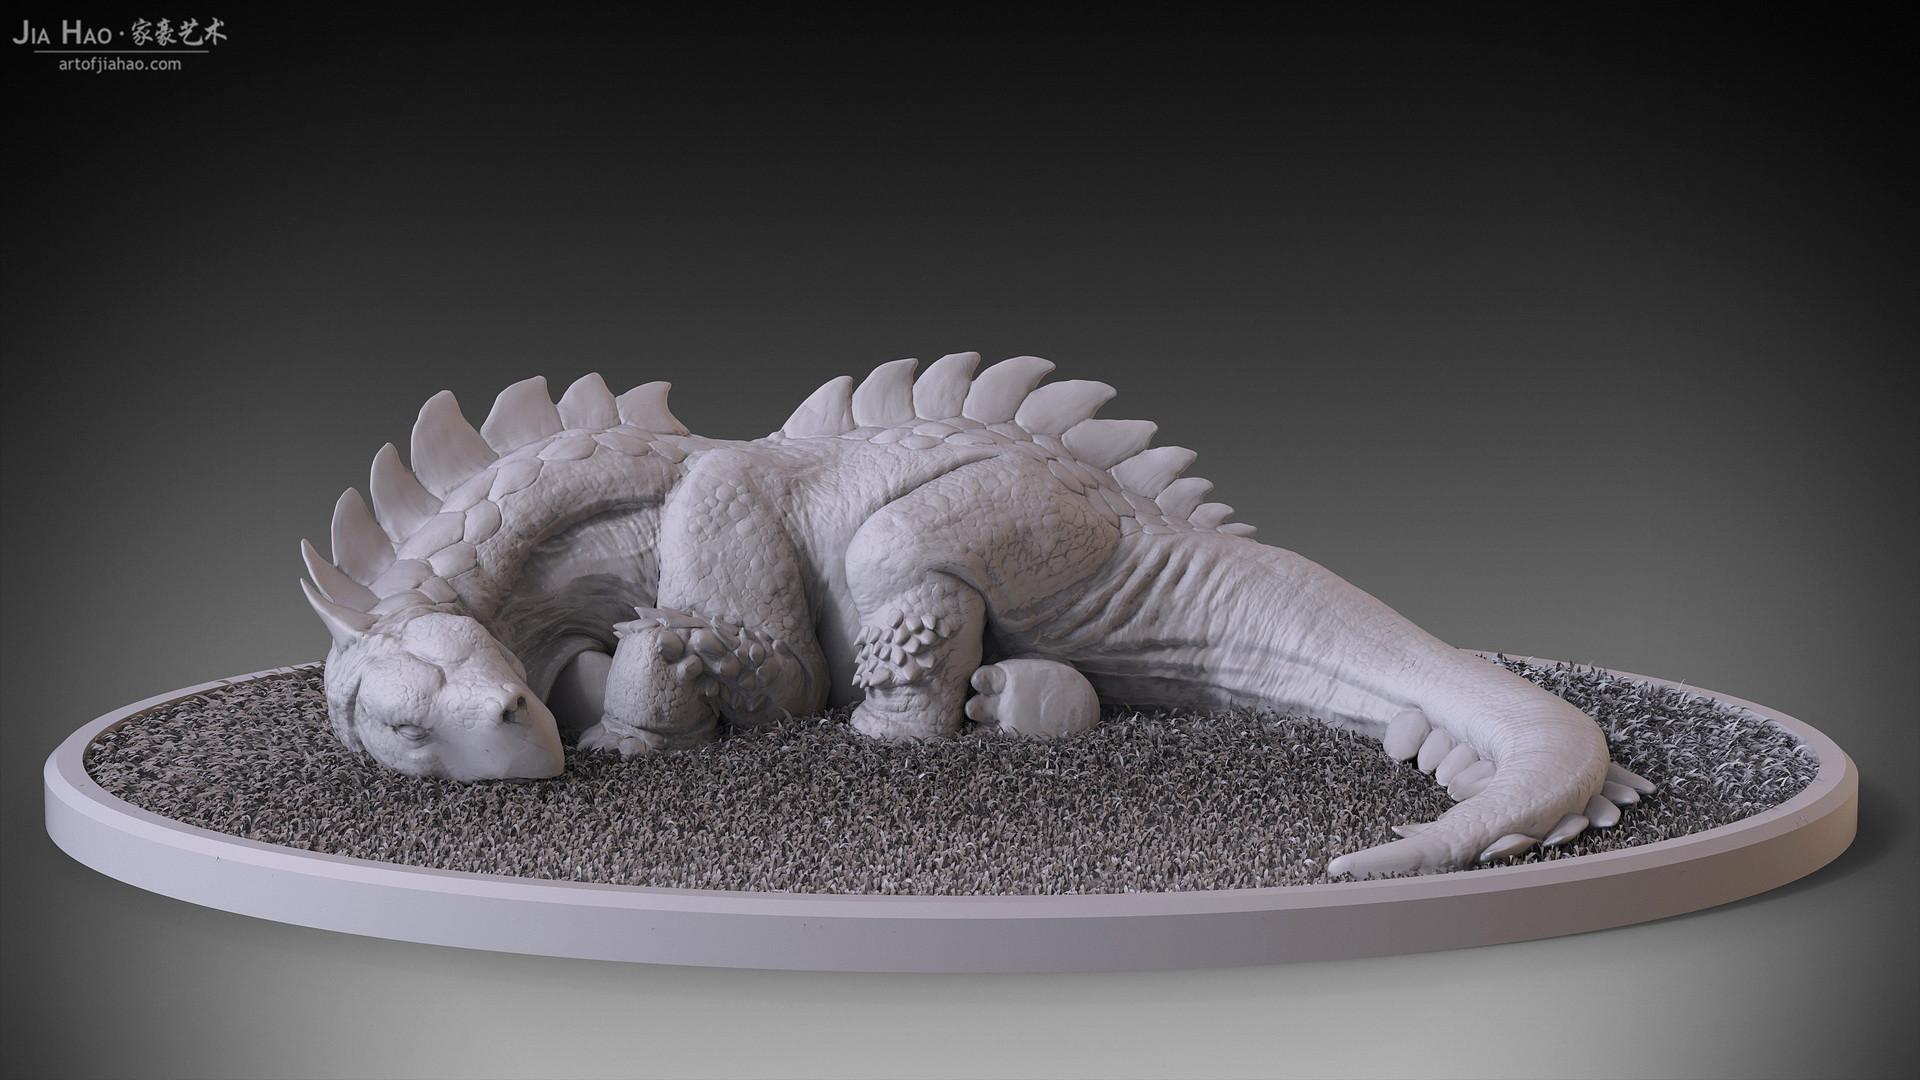 Jia hao 2017 tortoisaurussleeping digitalsculpting 01